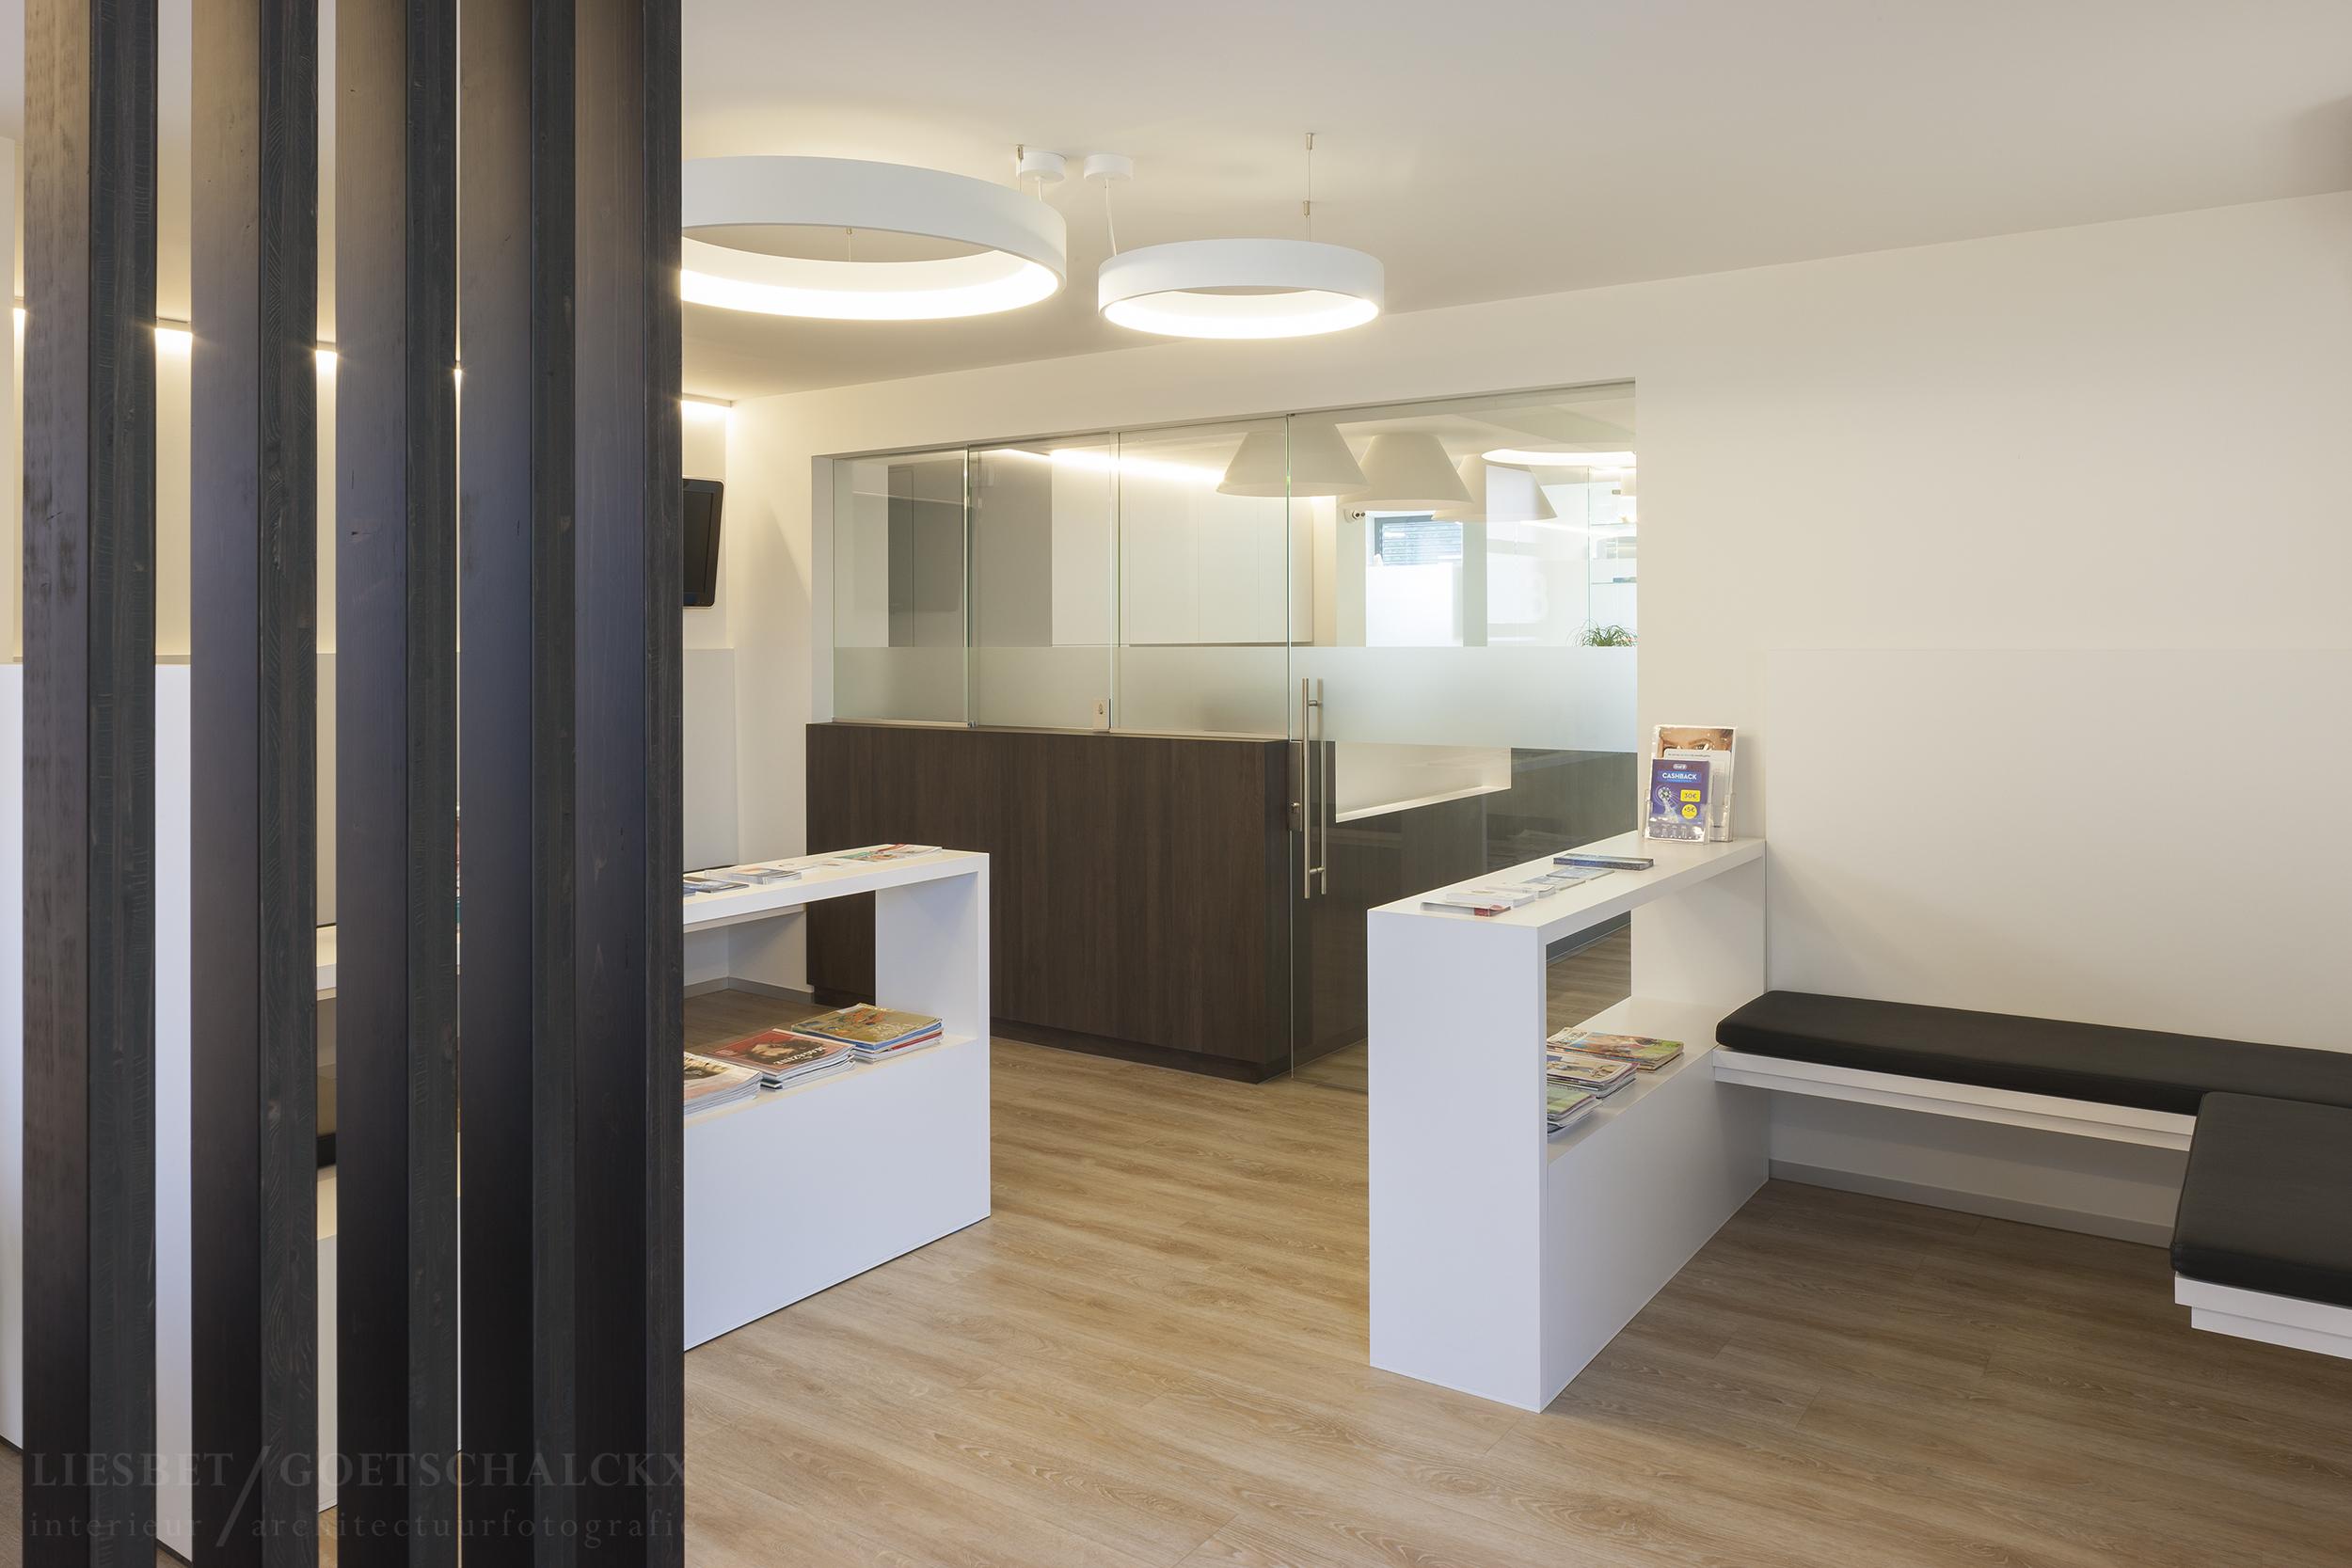 LG-Beneens-tandartspraktijkBosuil-Deurne_72dpi_watermerk-3.jpg